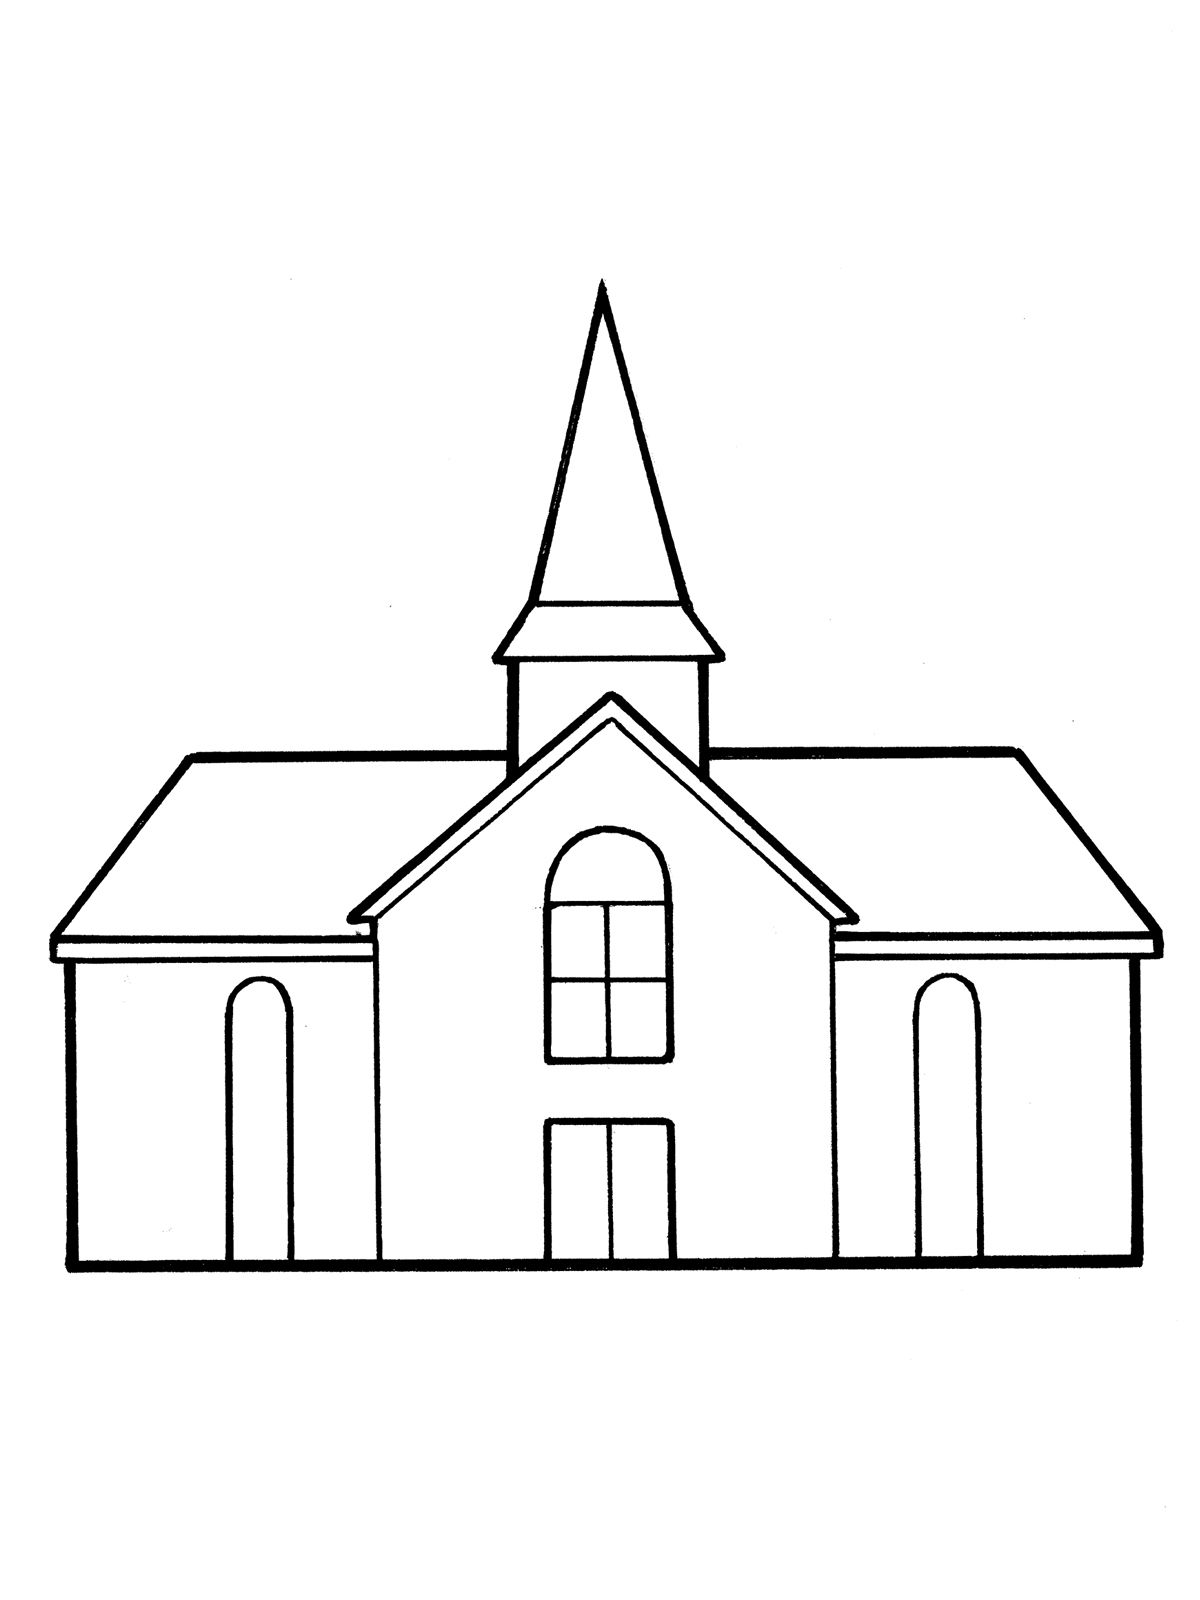 Lds church clipart 3 » Clipart Station.